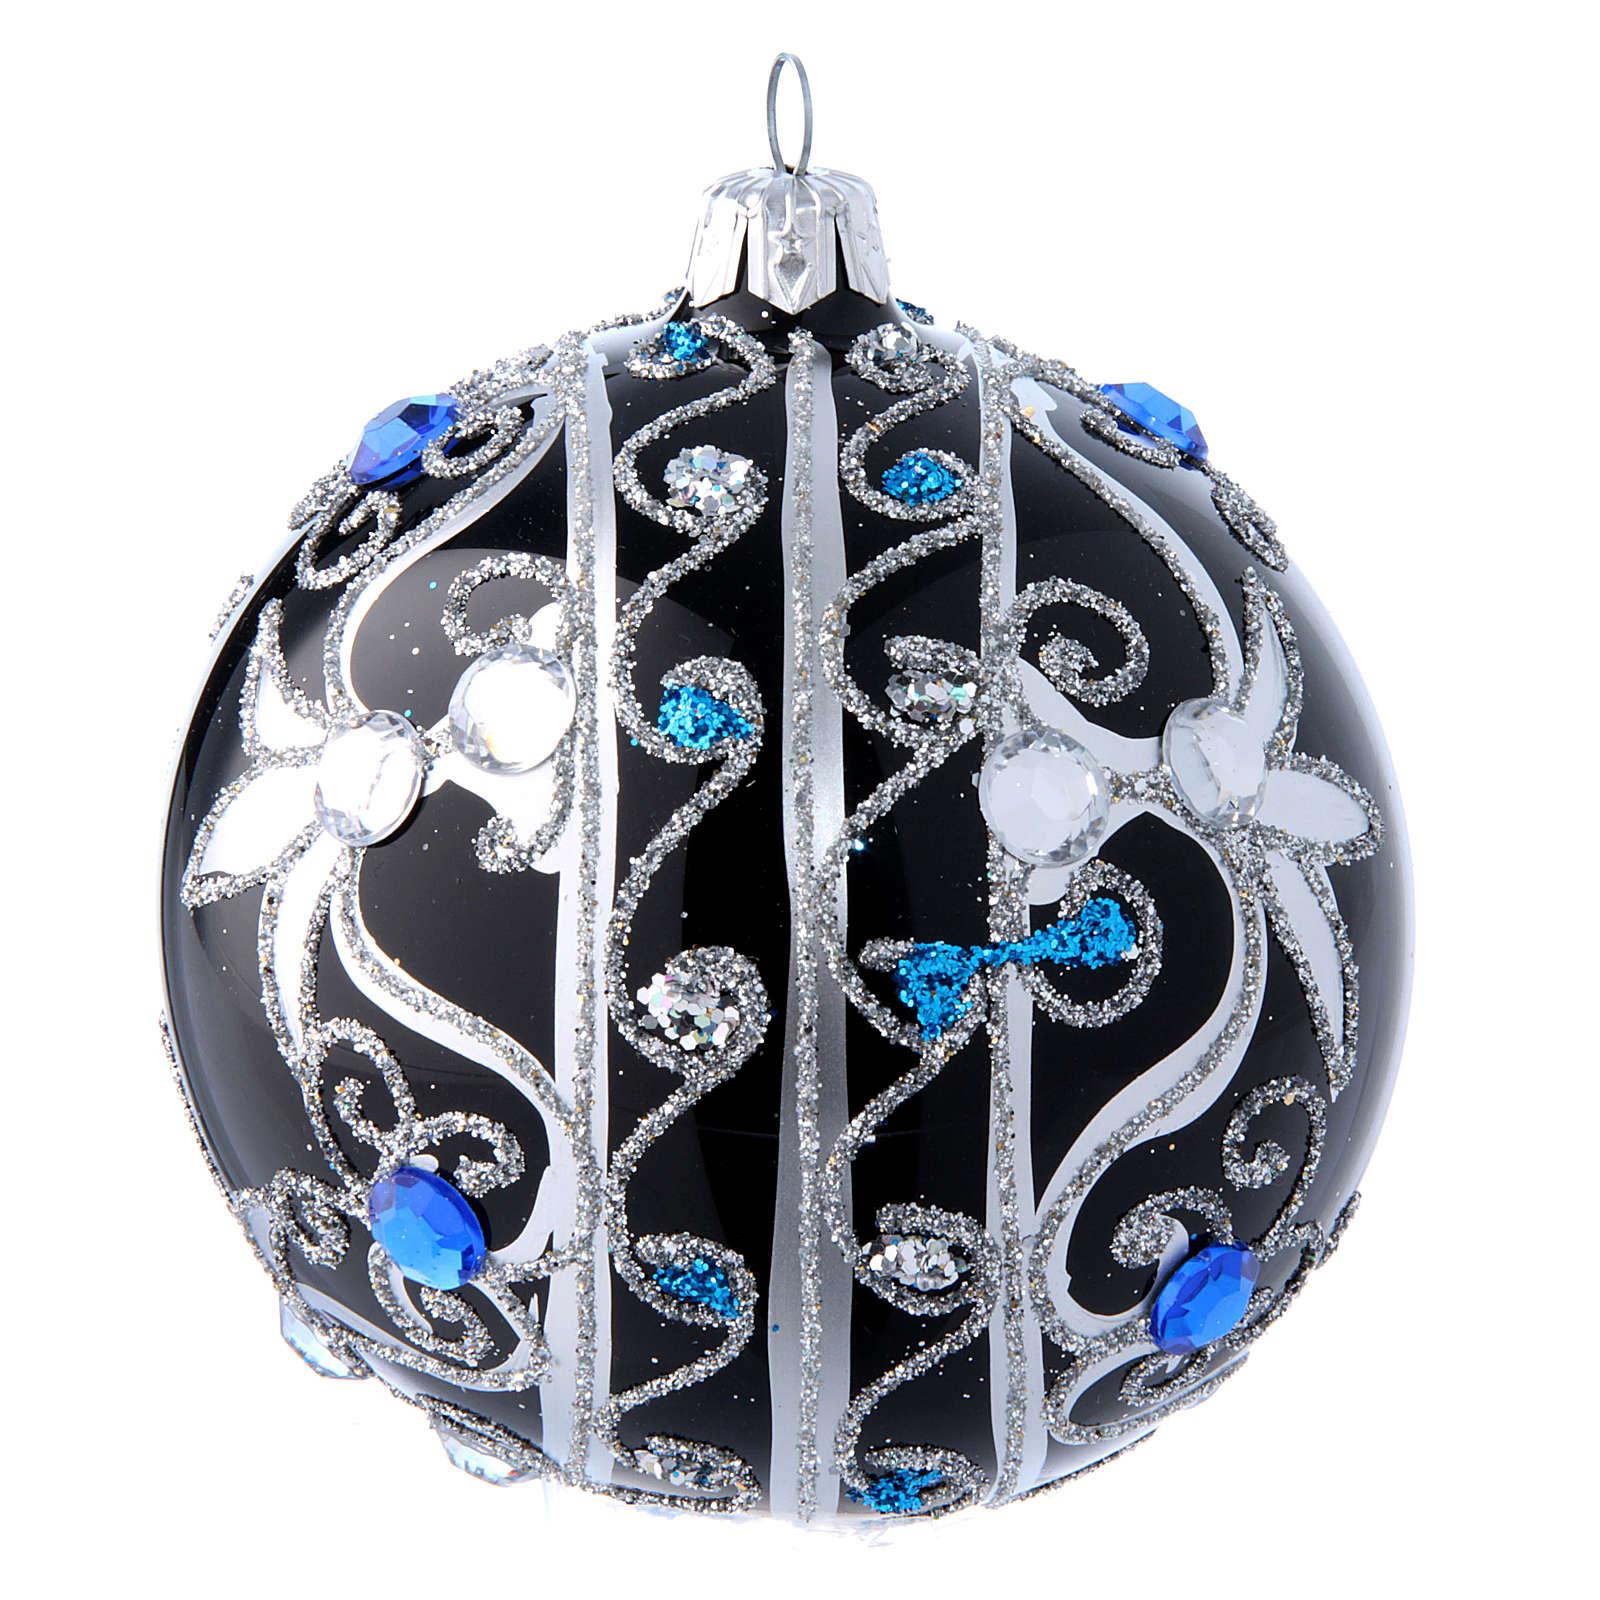 Pallina vetro decoro nero e argento 100 mm | vendita ...